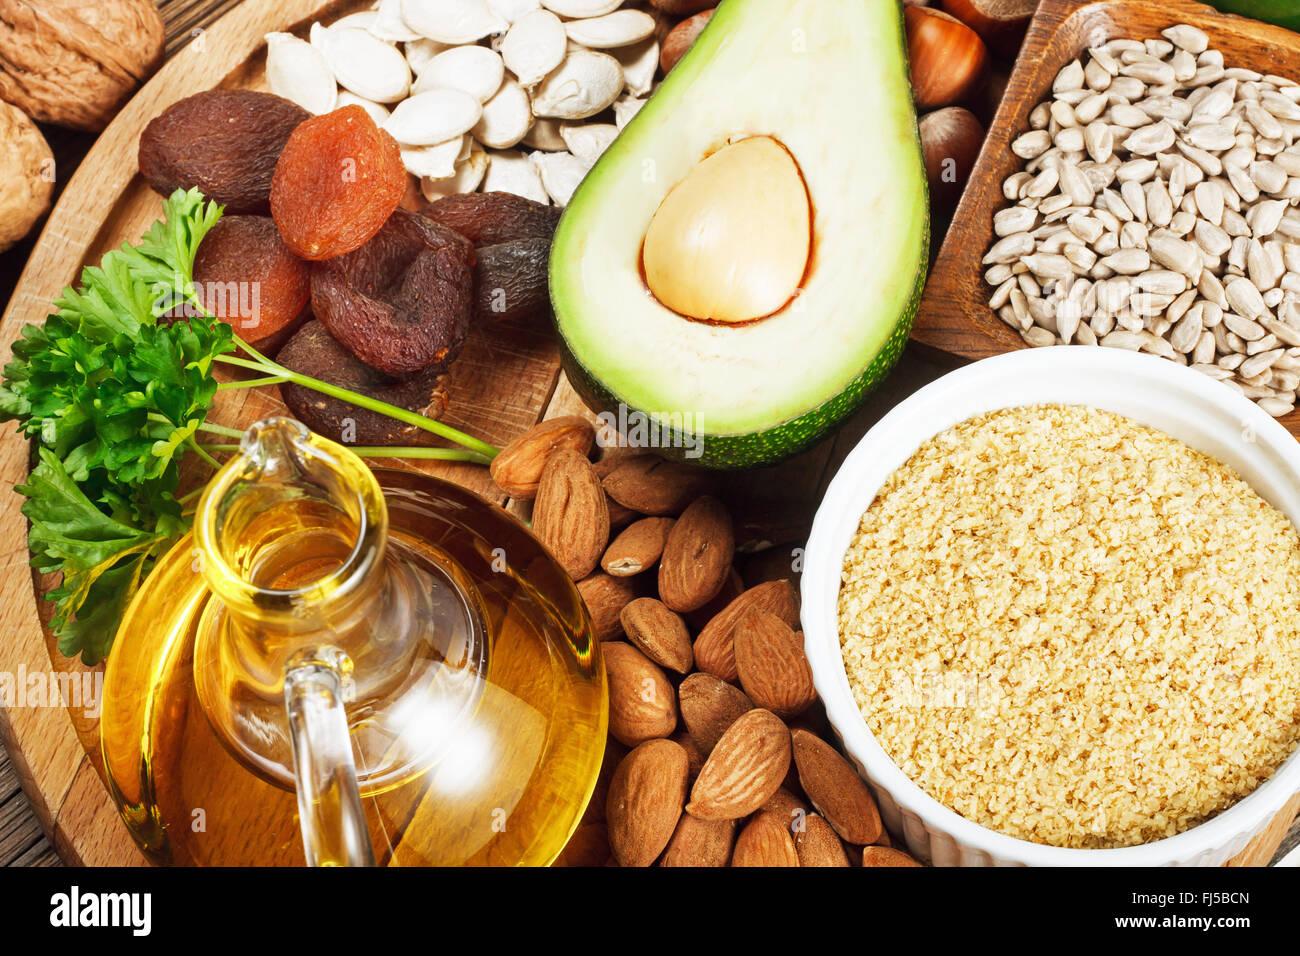 Foods rich in vitamin E - Stock Image